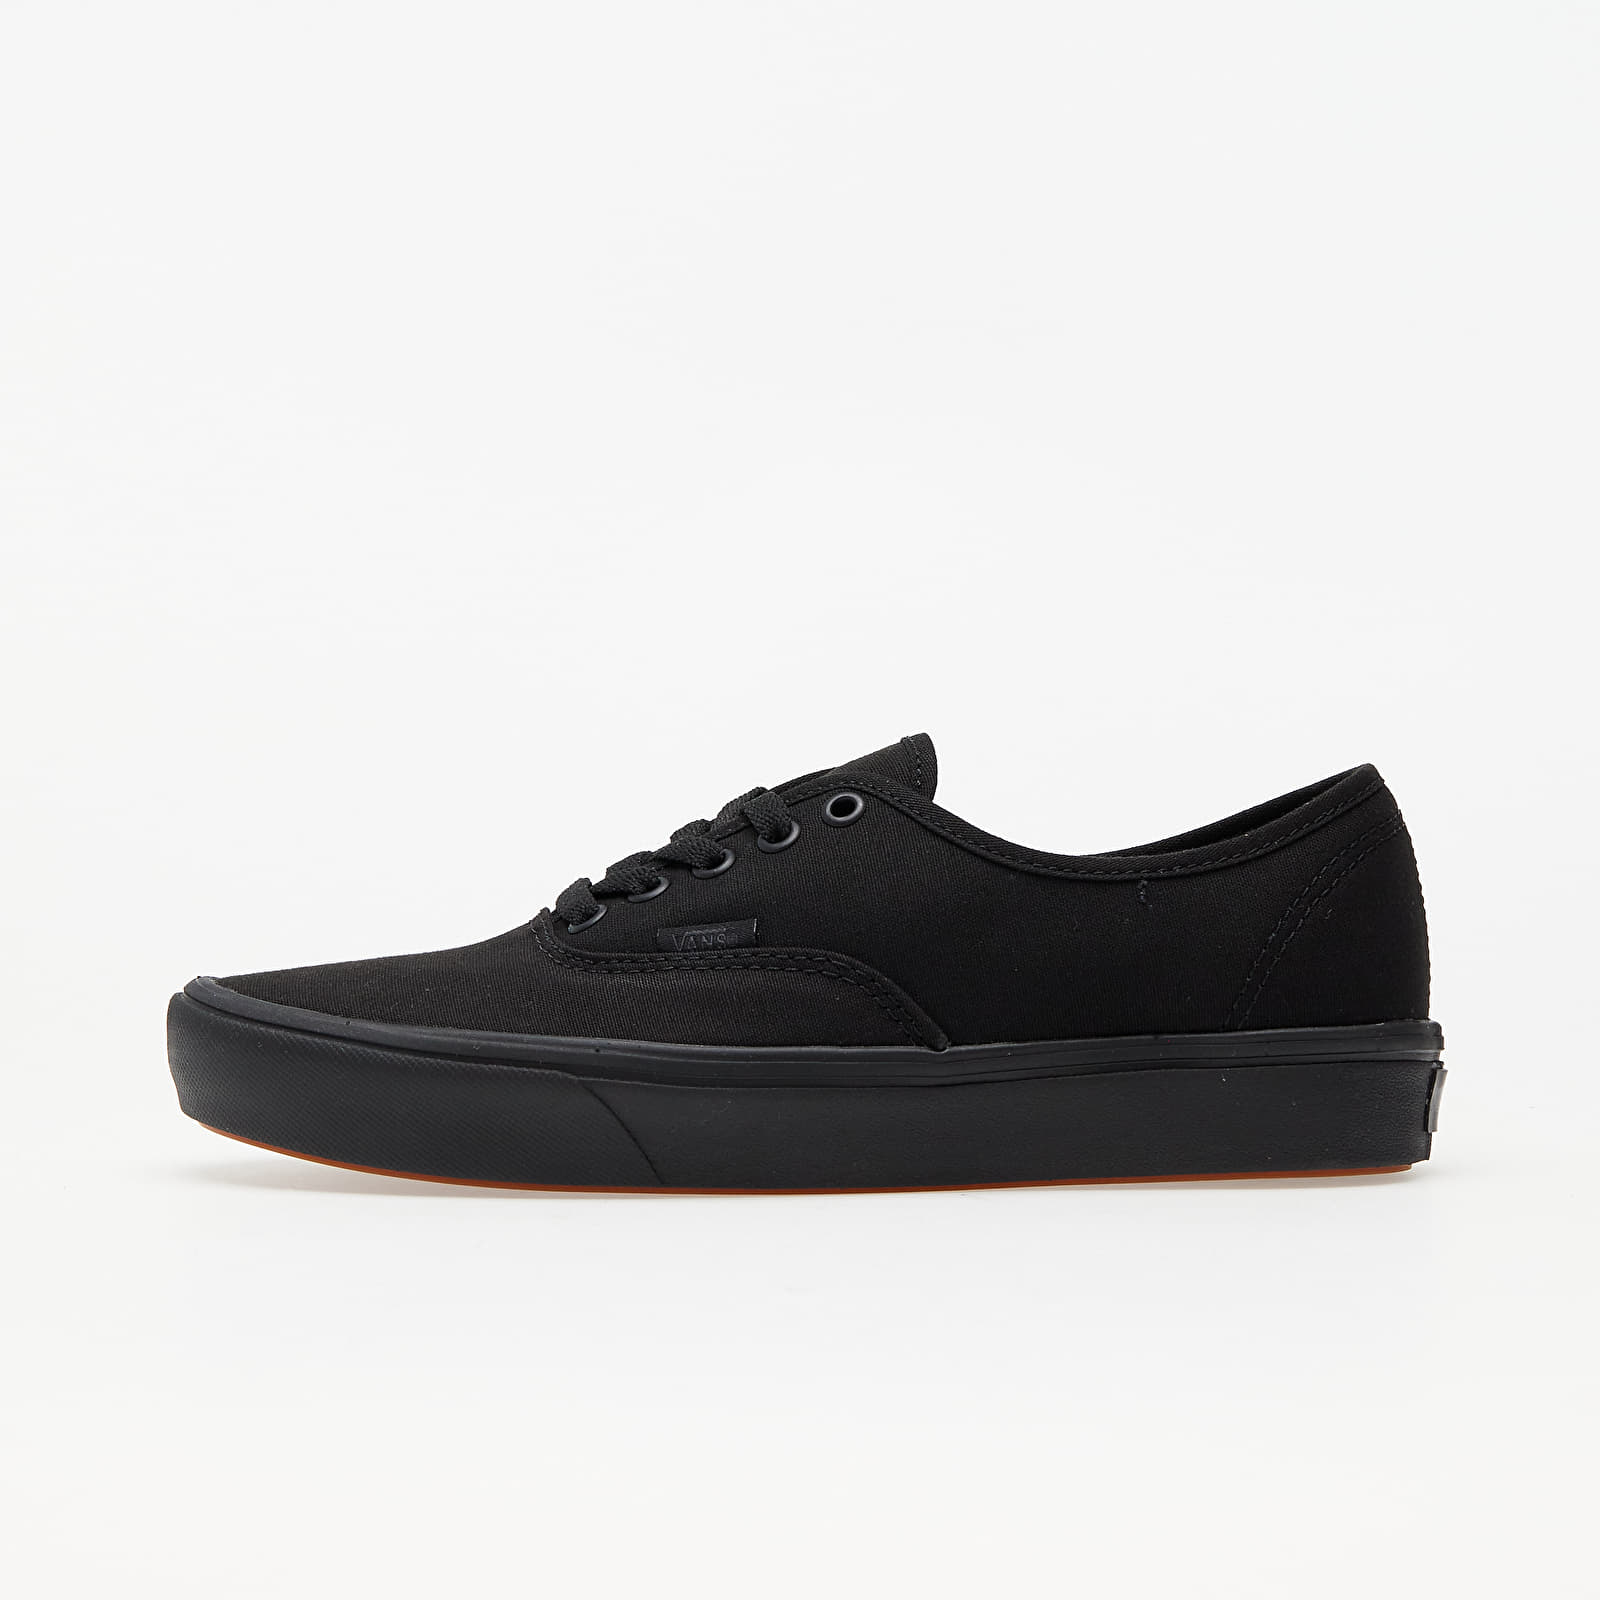 Pánské tenisky a boty Vans ComfyCush Authentic (Classic) Black/ Black